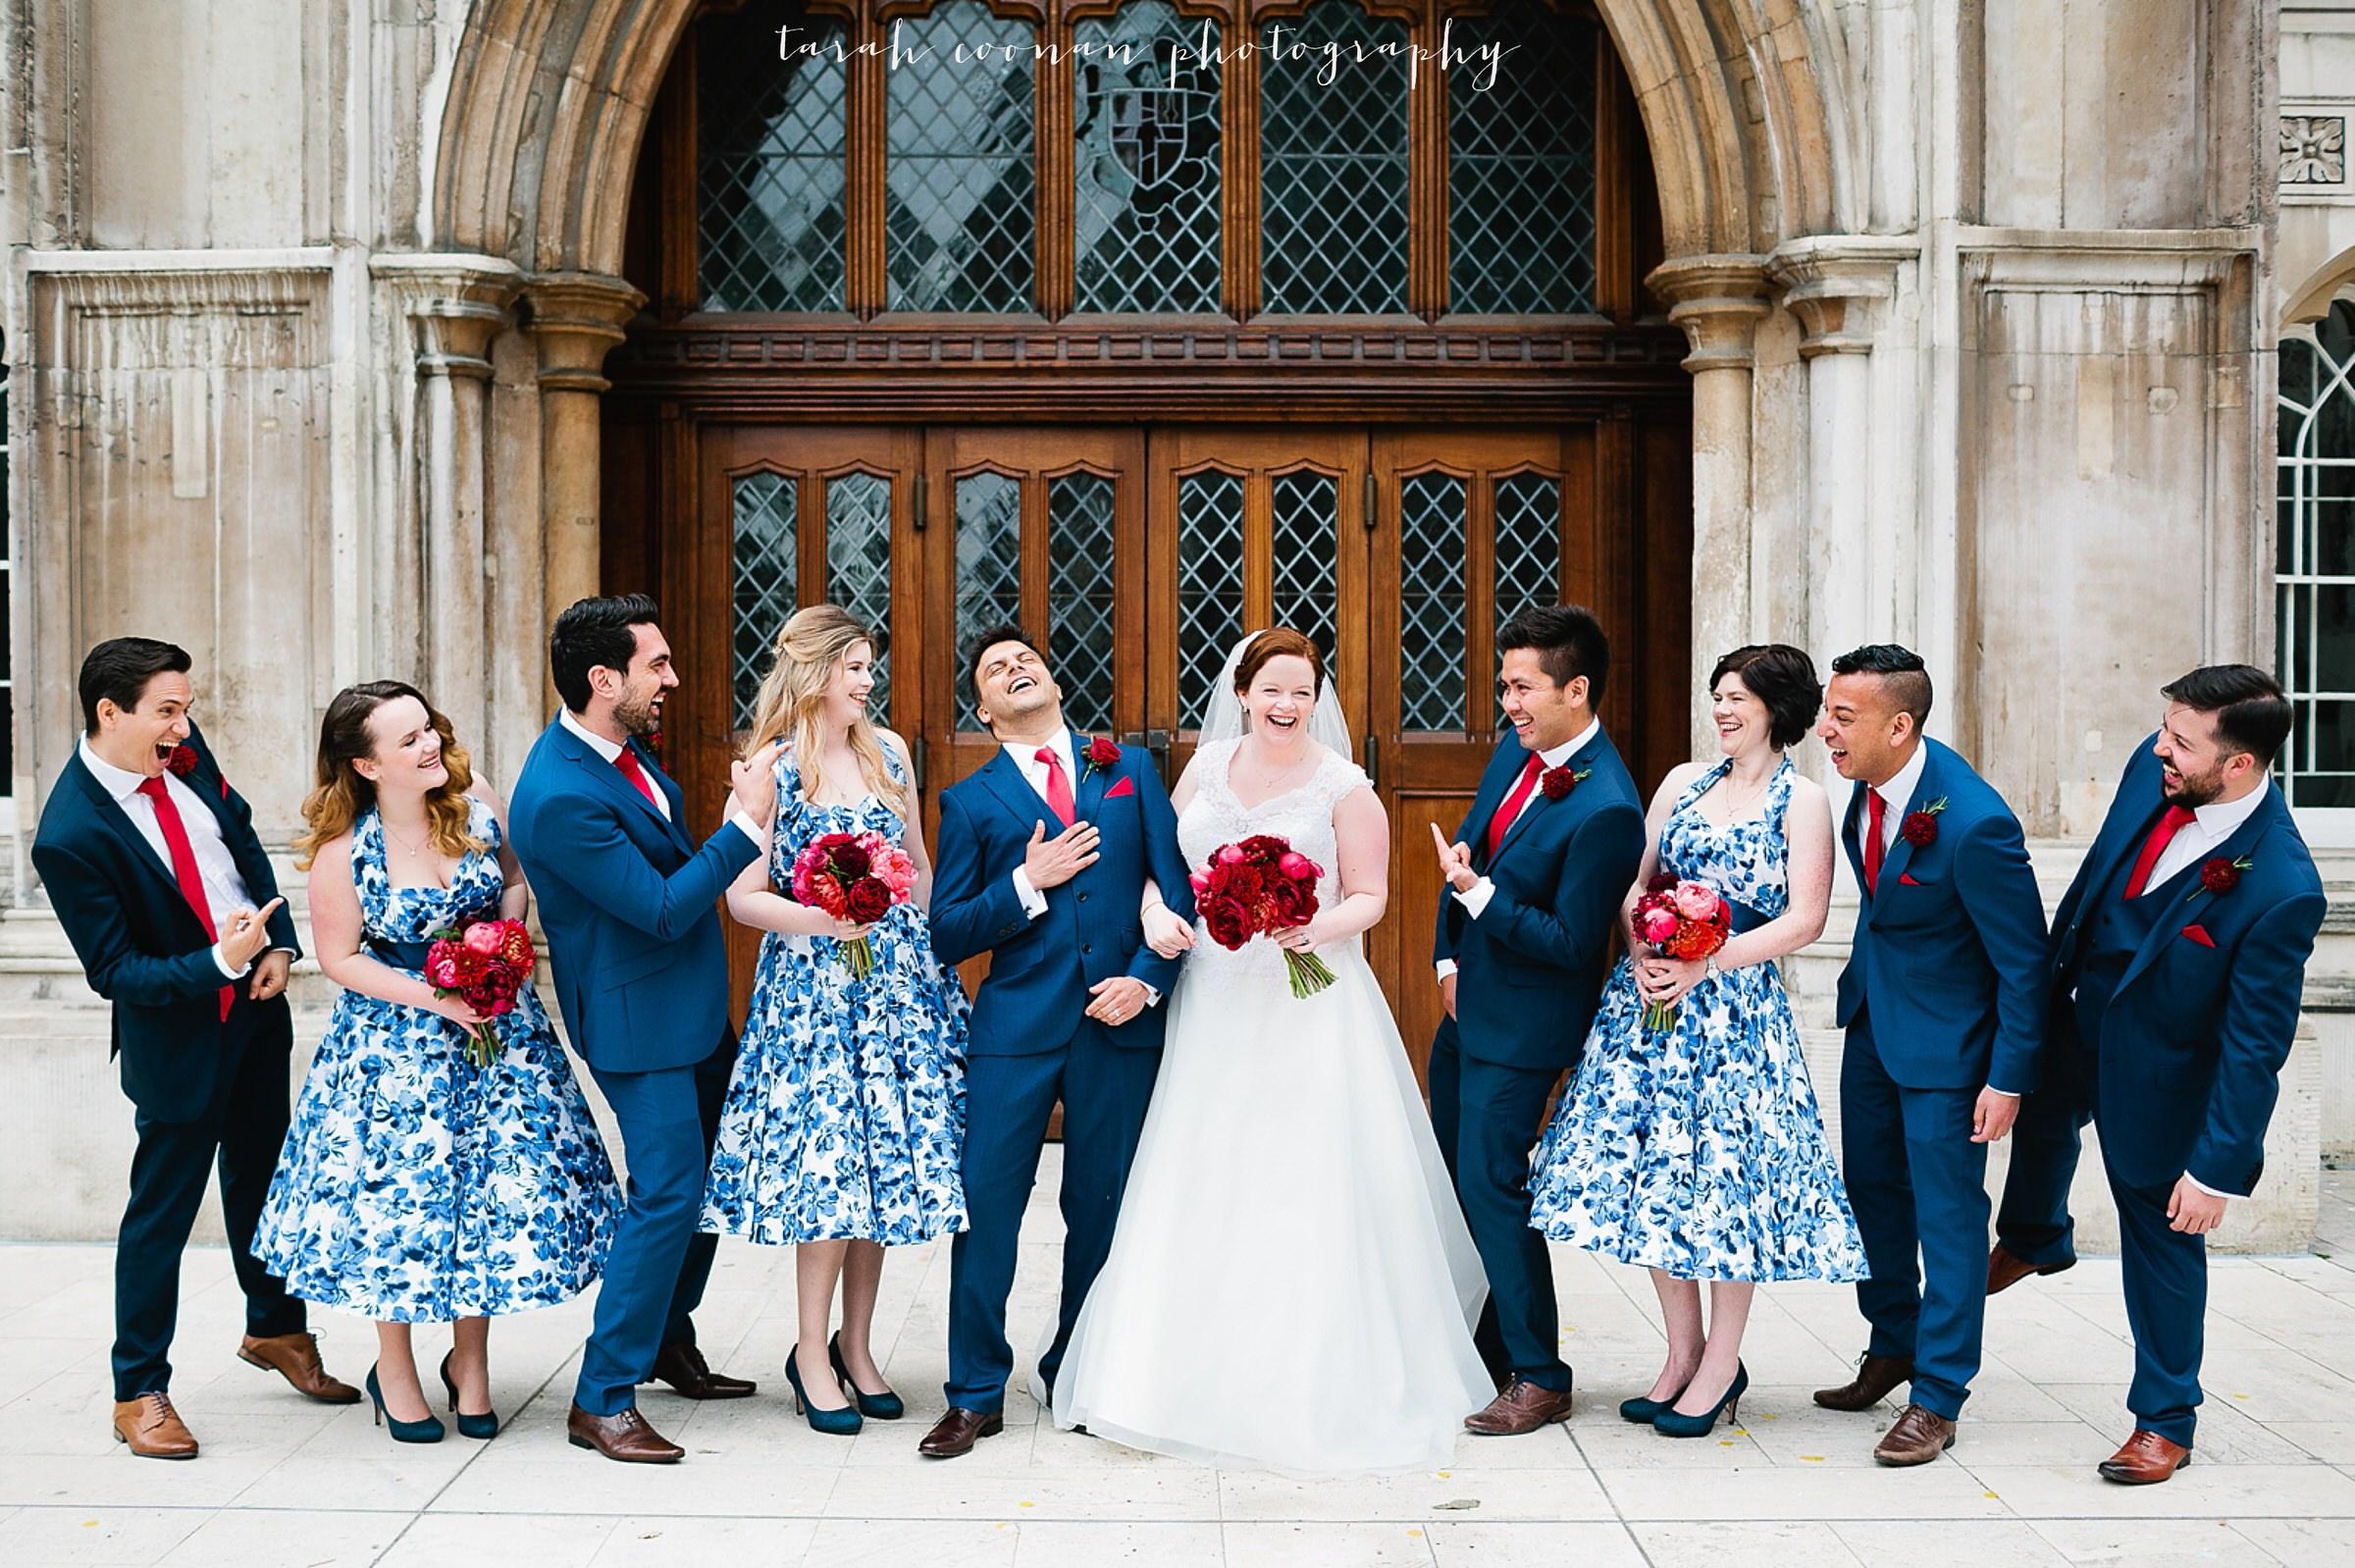 London Town Hall wedding - Luke & Gillian